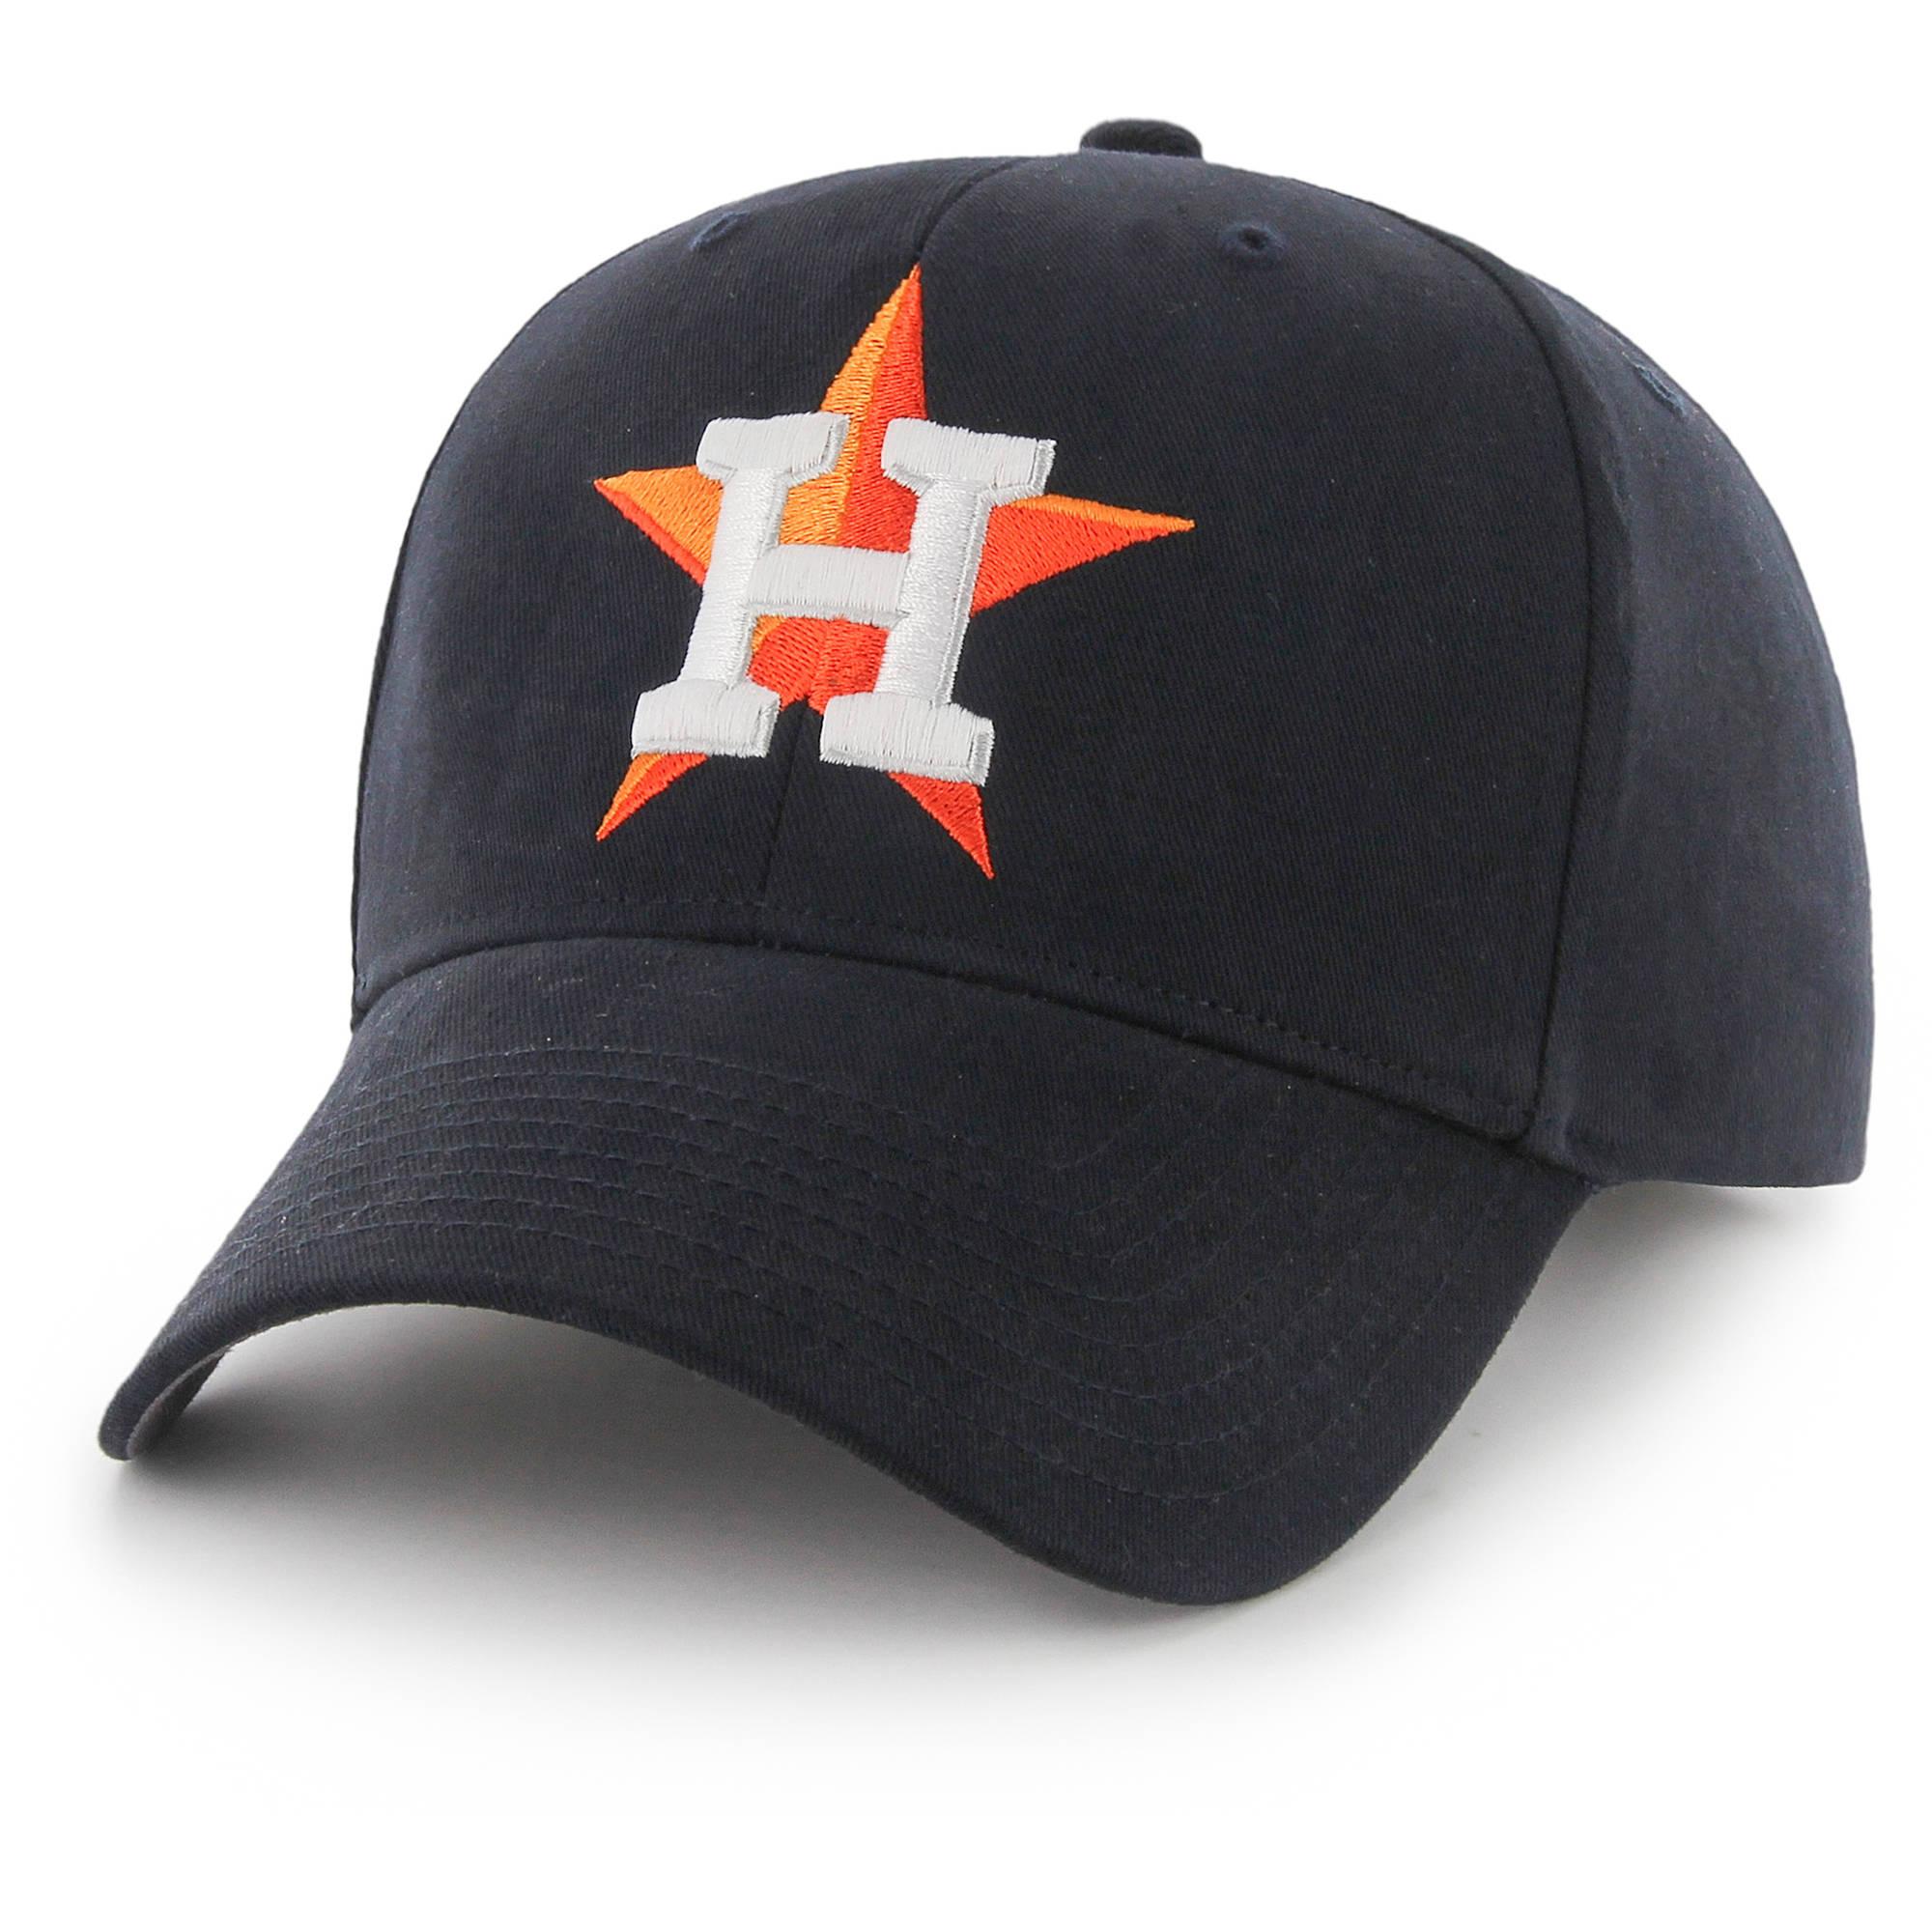 MLB Houston Astros Basic Cap / Hat by Fan Favorite